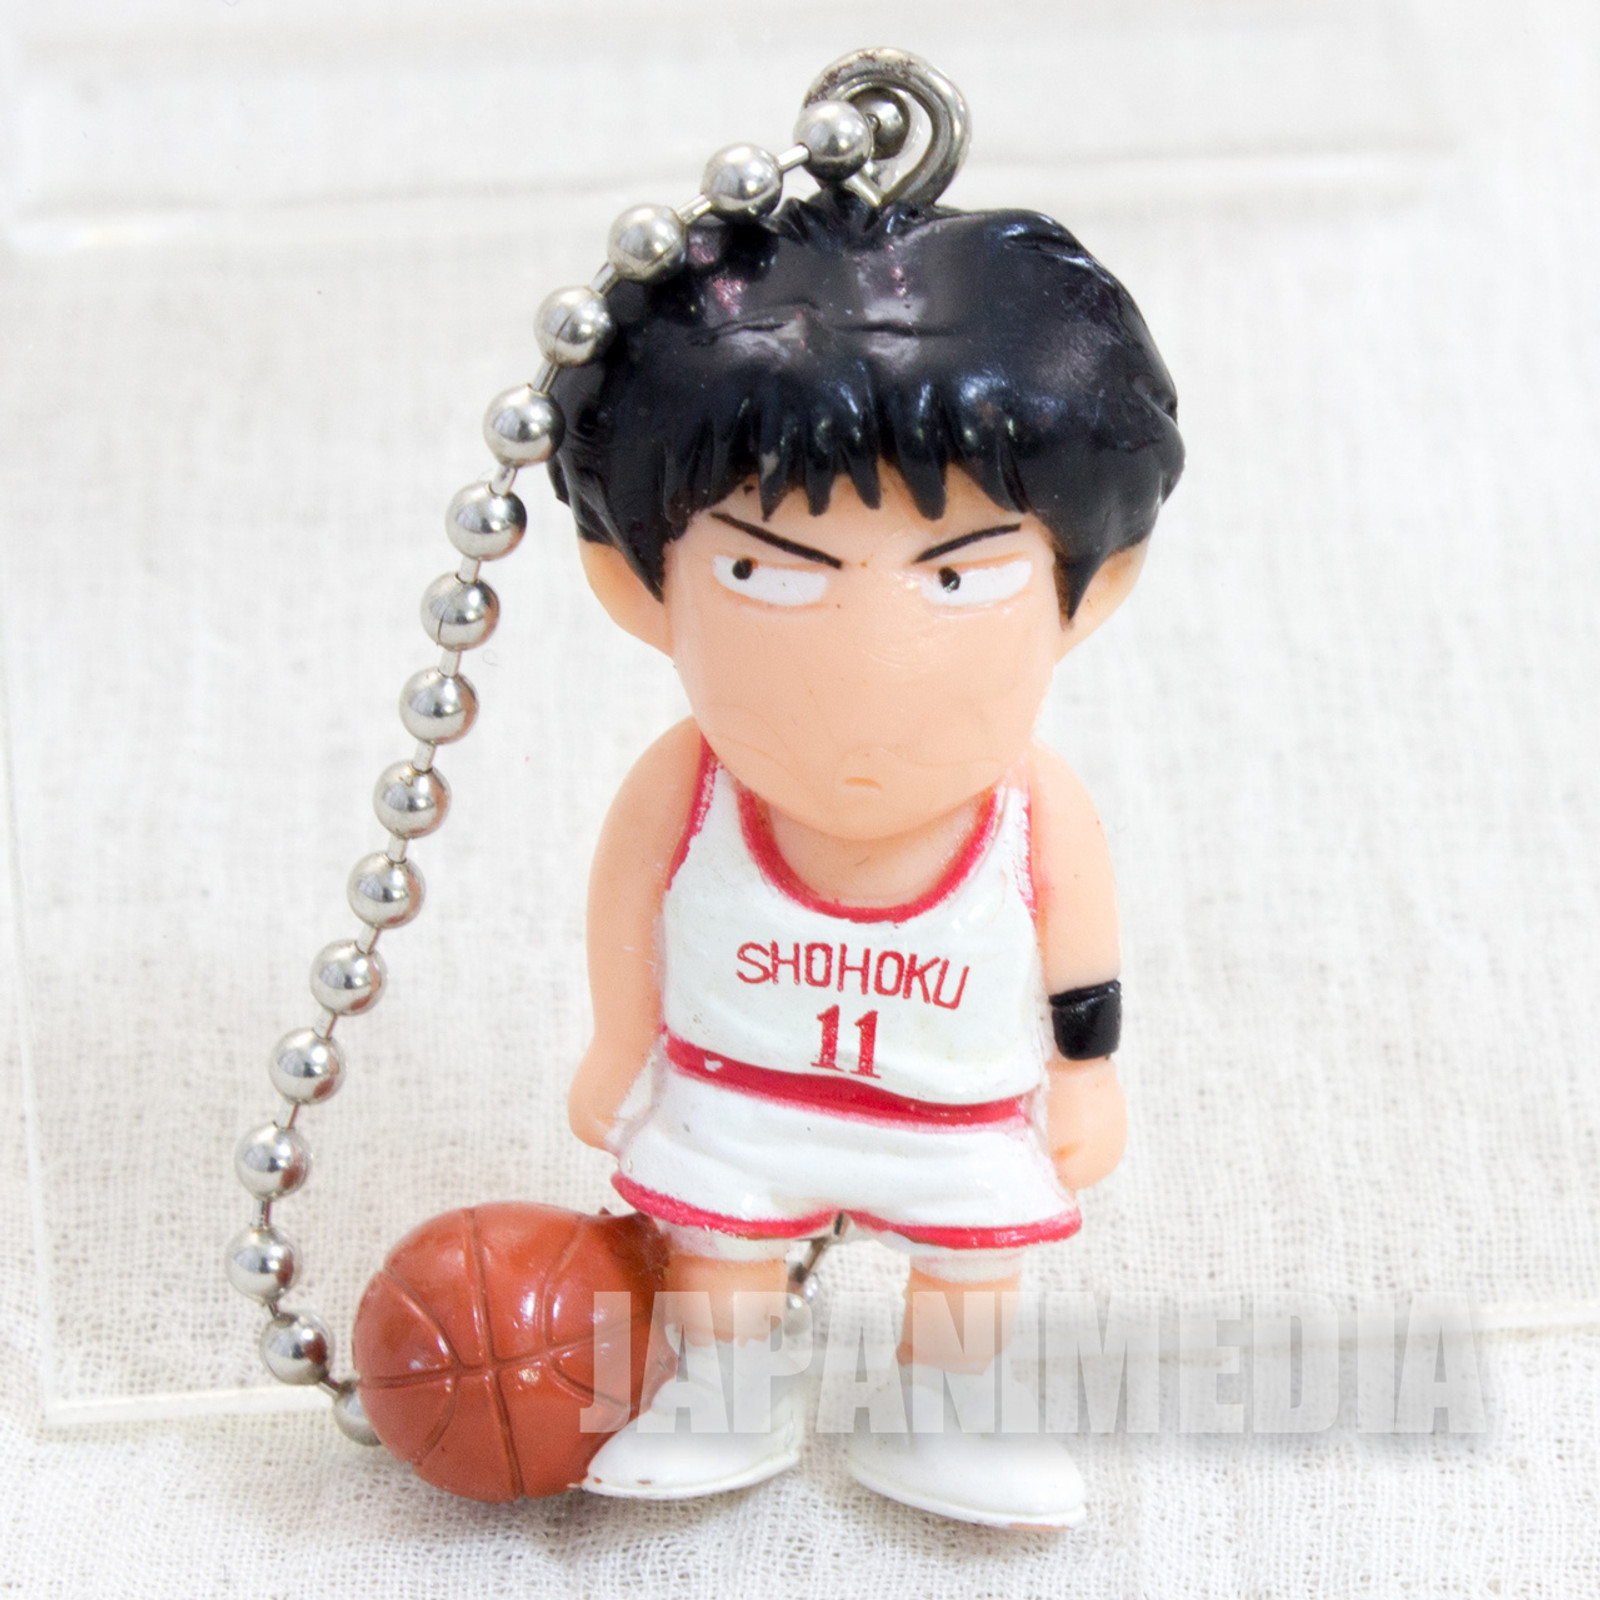 SLAM DUNK Kaede Rukawa Mini Figure Ball Key Chain JAPAN ANIME MANGA 2